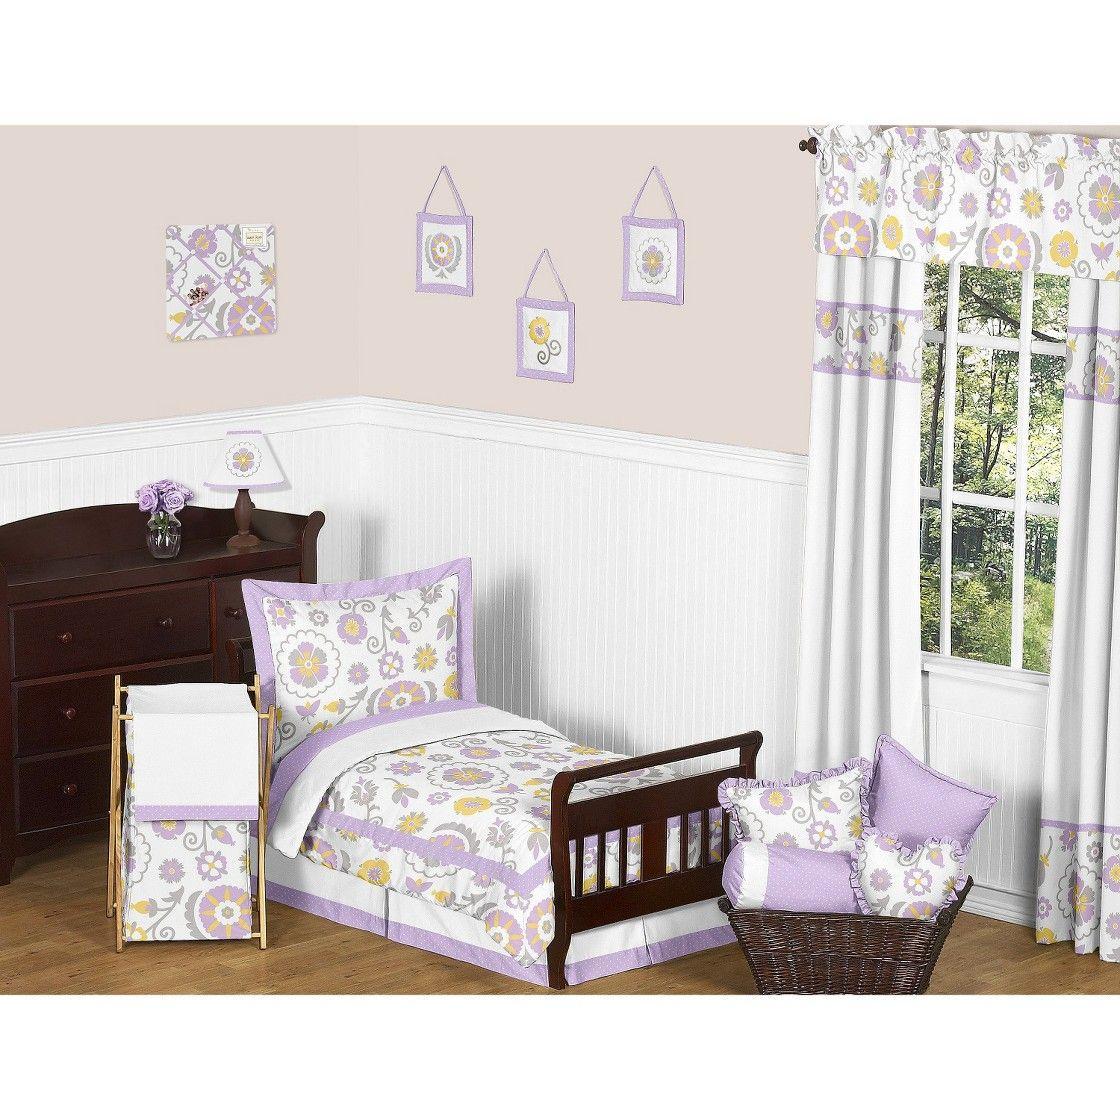 Sweet Jojo Designs 5pc Lavender Suzanna Toddler Bedding Set